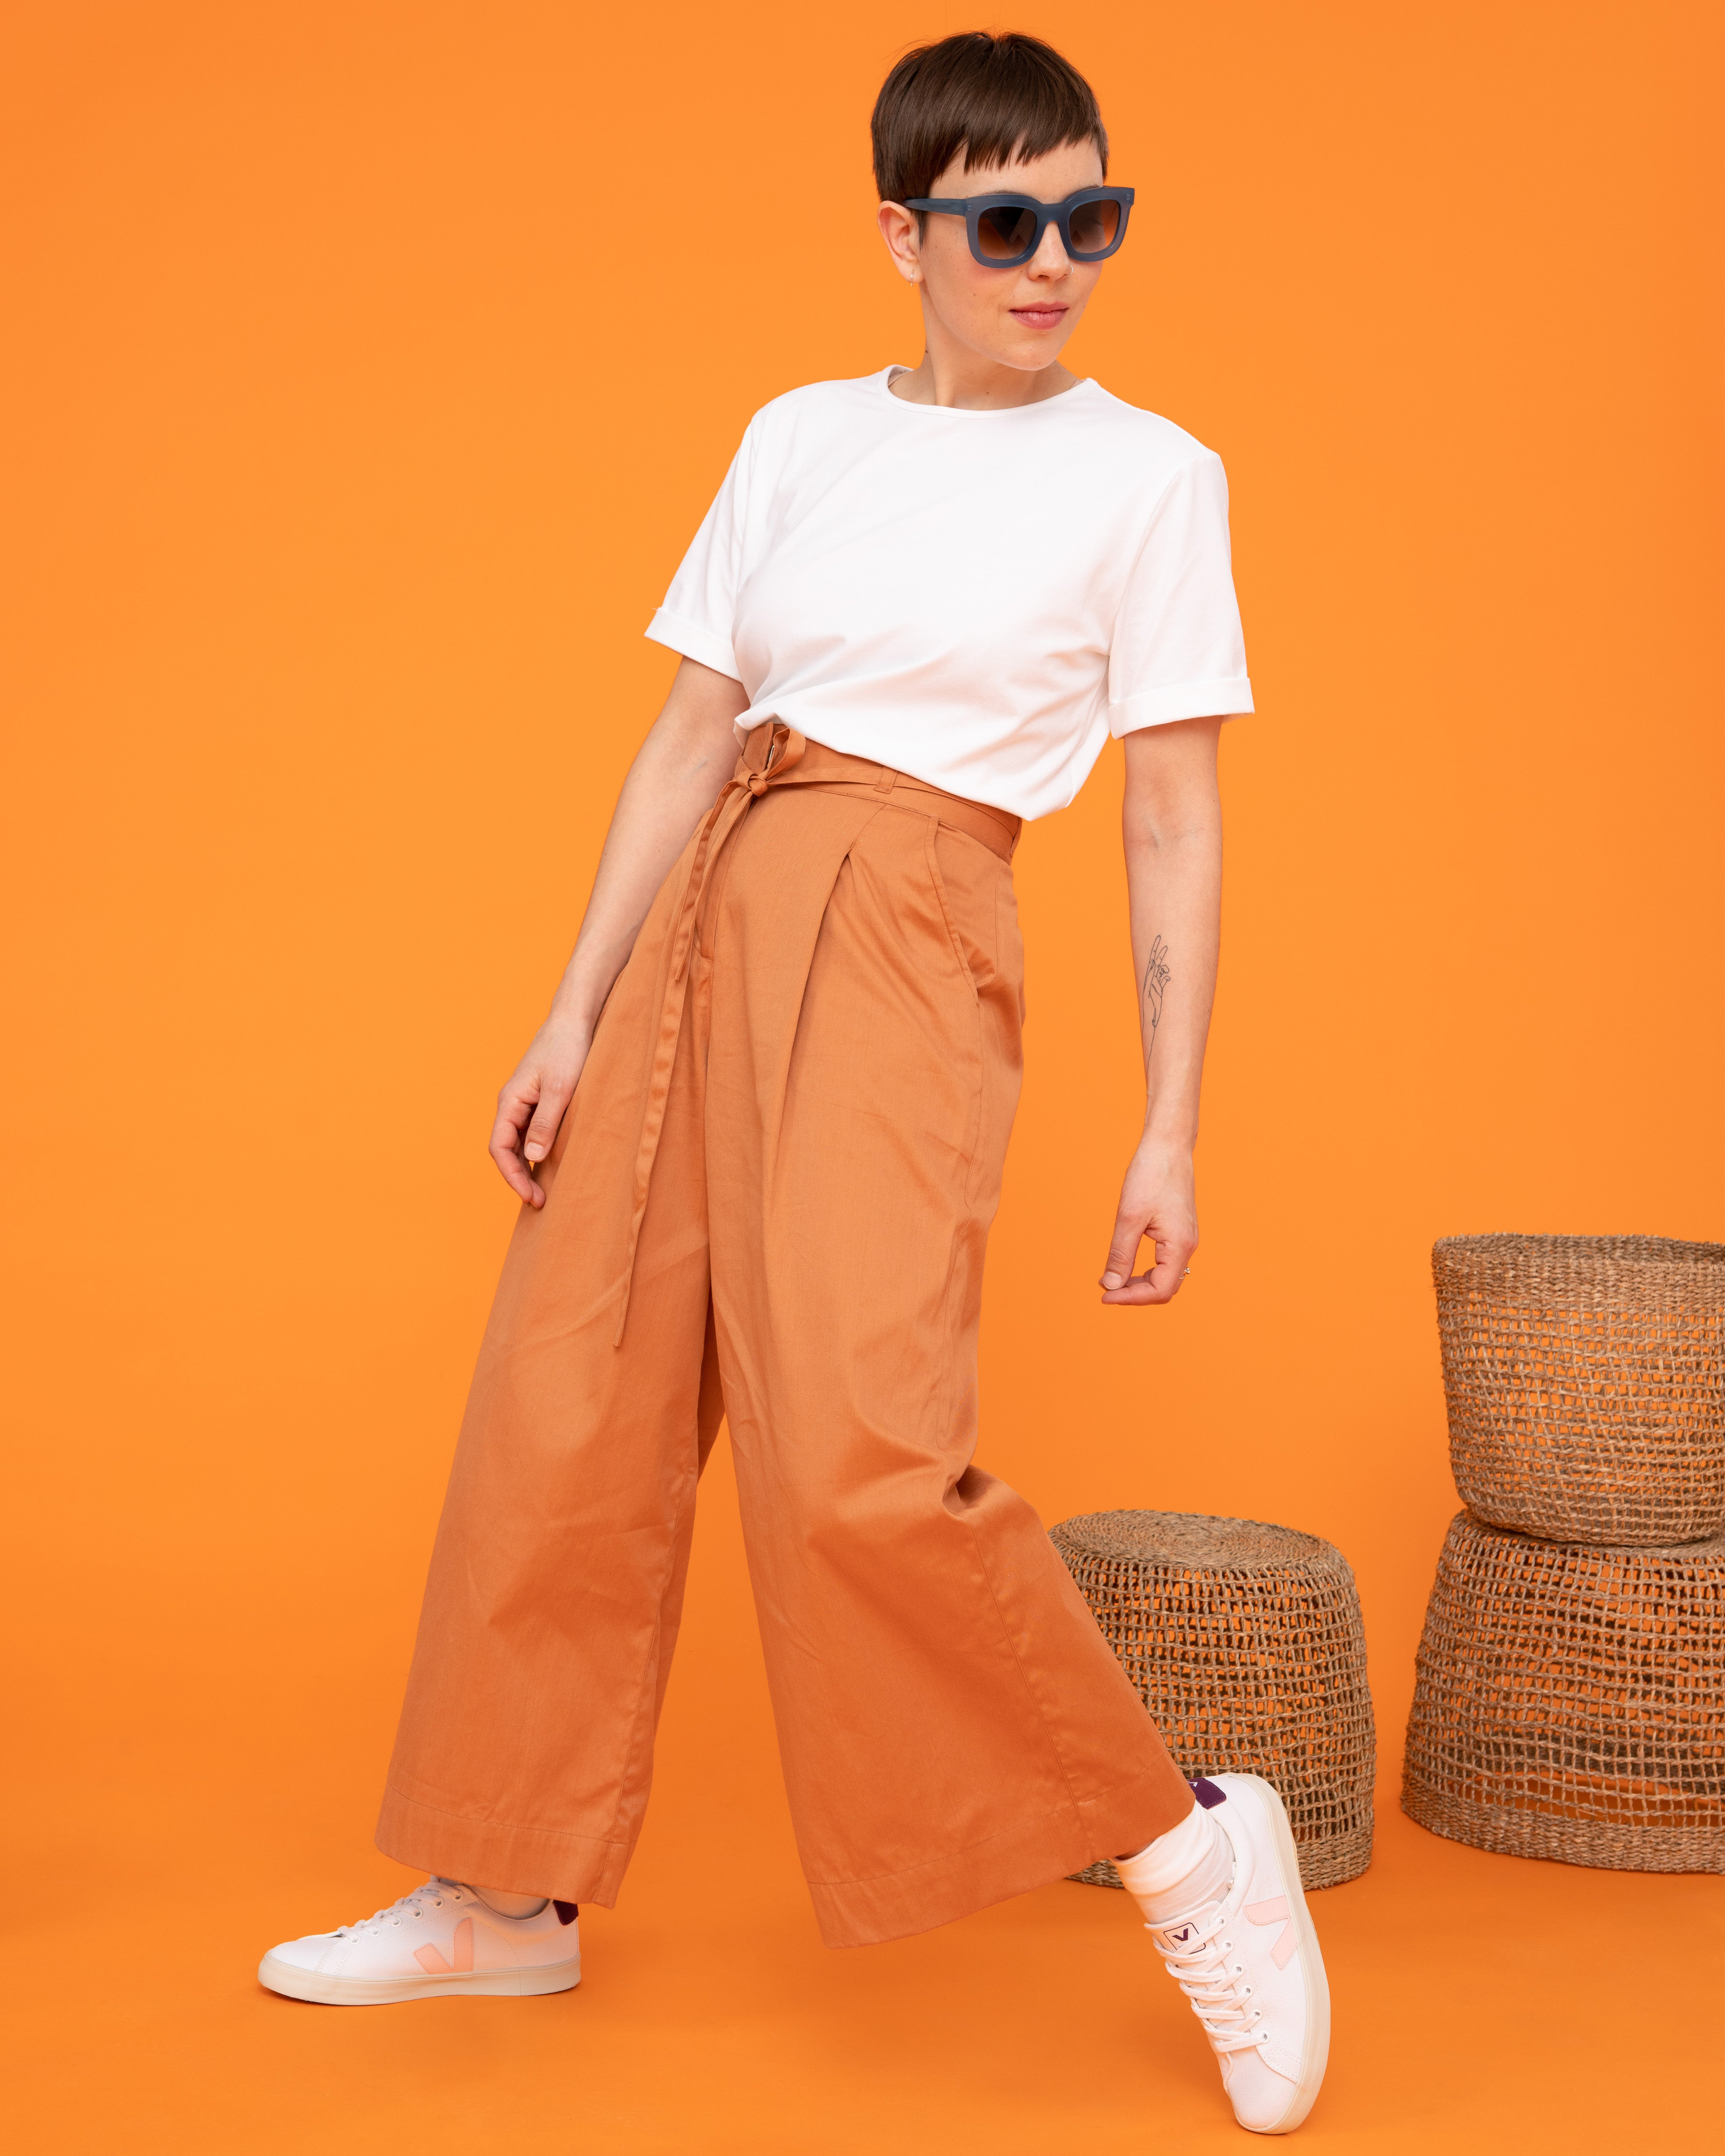 Frau trägt weißes Shirt und orangefarbene Hose